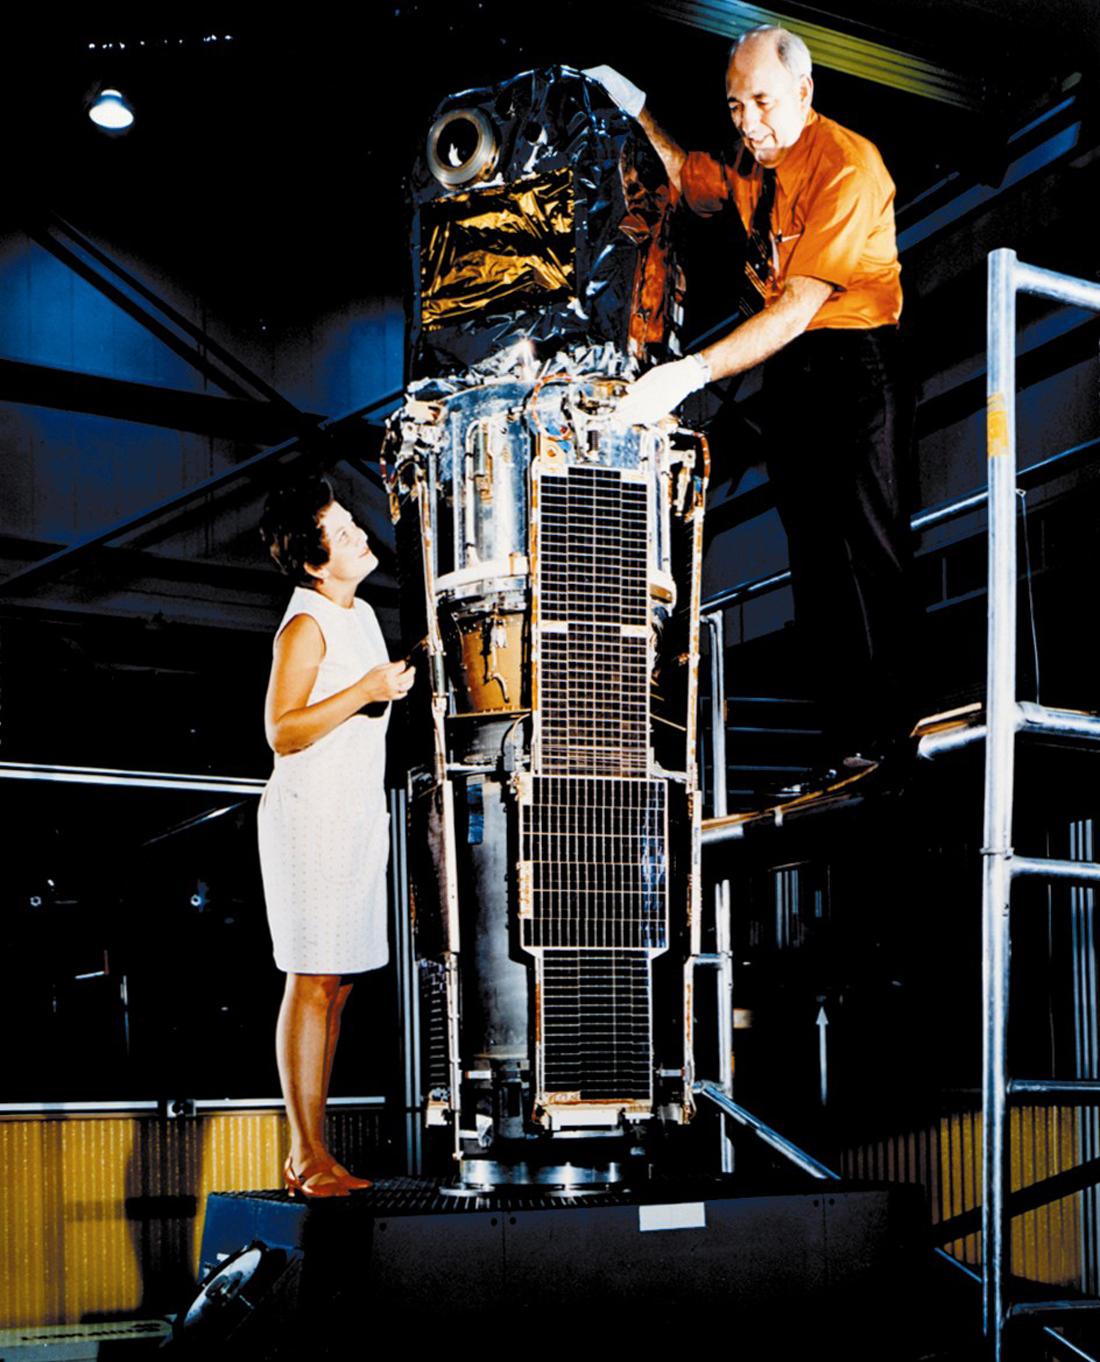 Spektr, Спектр-РГ, Uhuru, X-Ray_Explorer_Satellite Uhuru